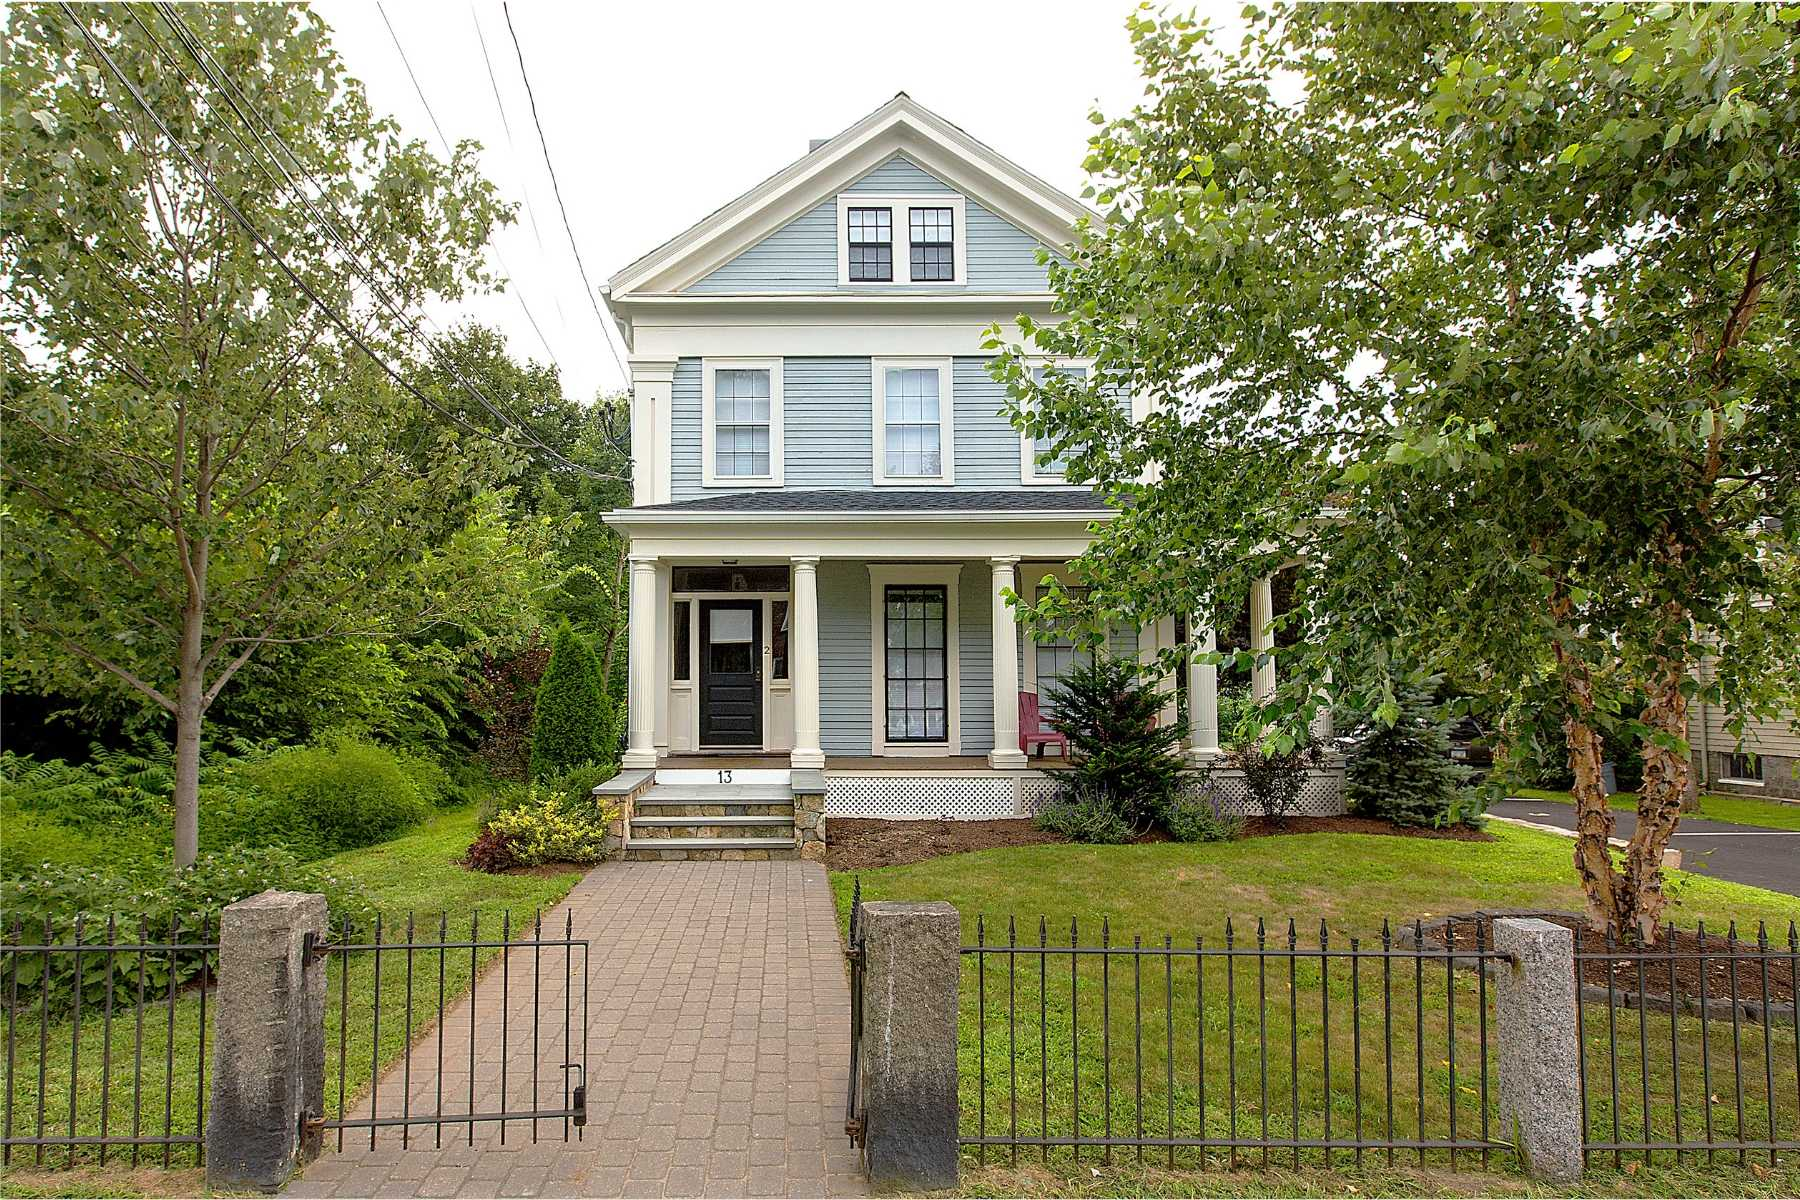 1-CapstoneCommunities-property-13 WinterStreet-Arlington.jpg